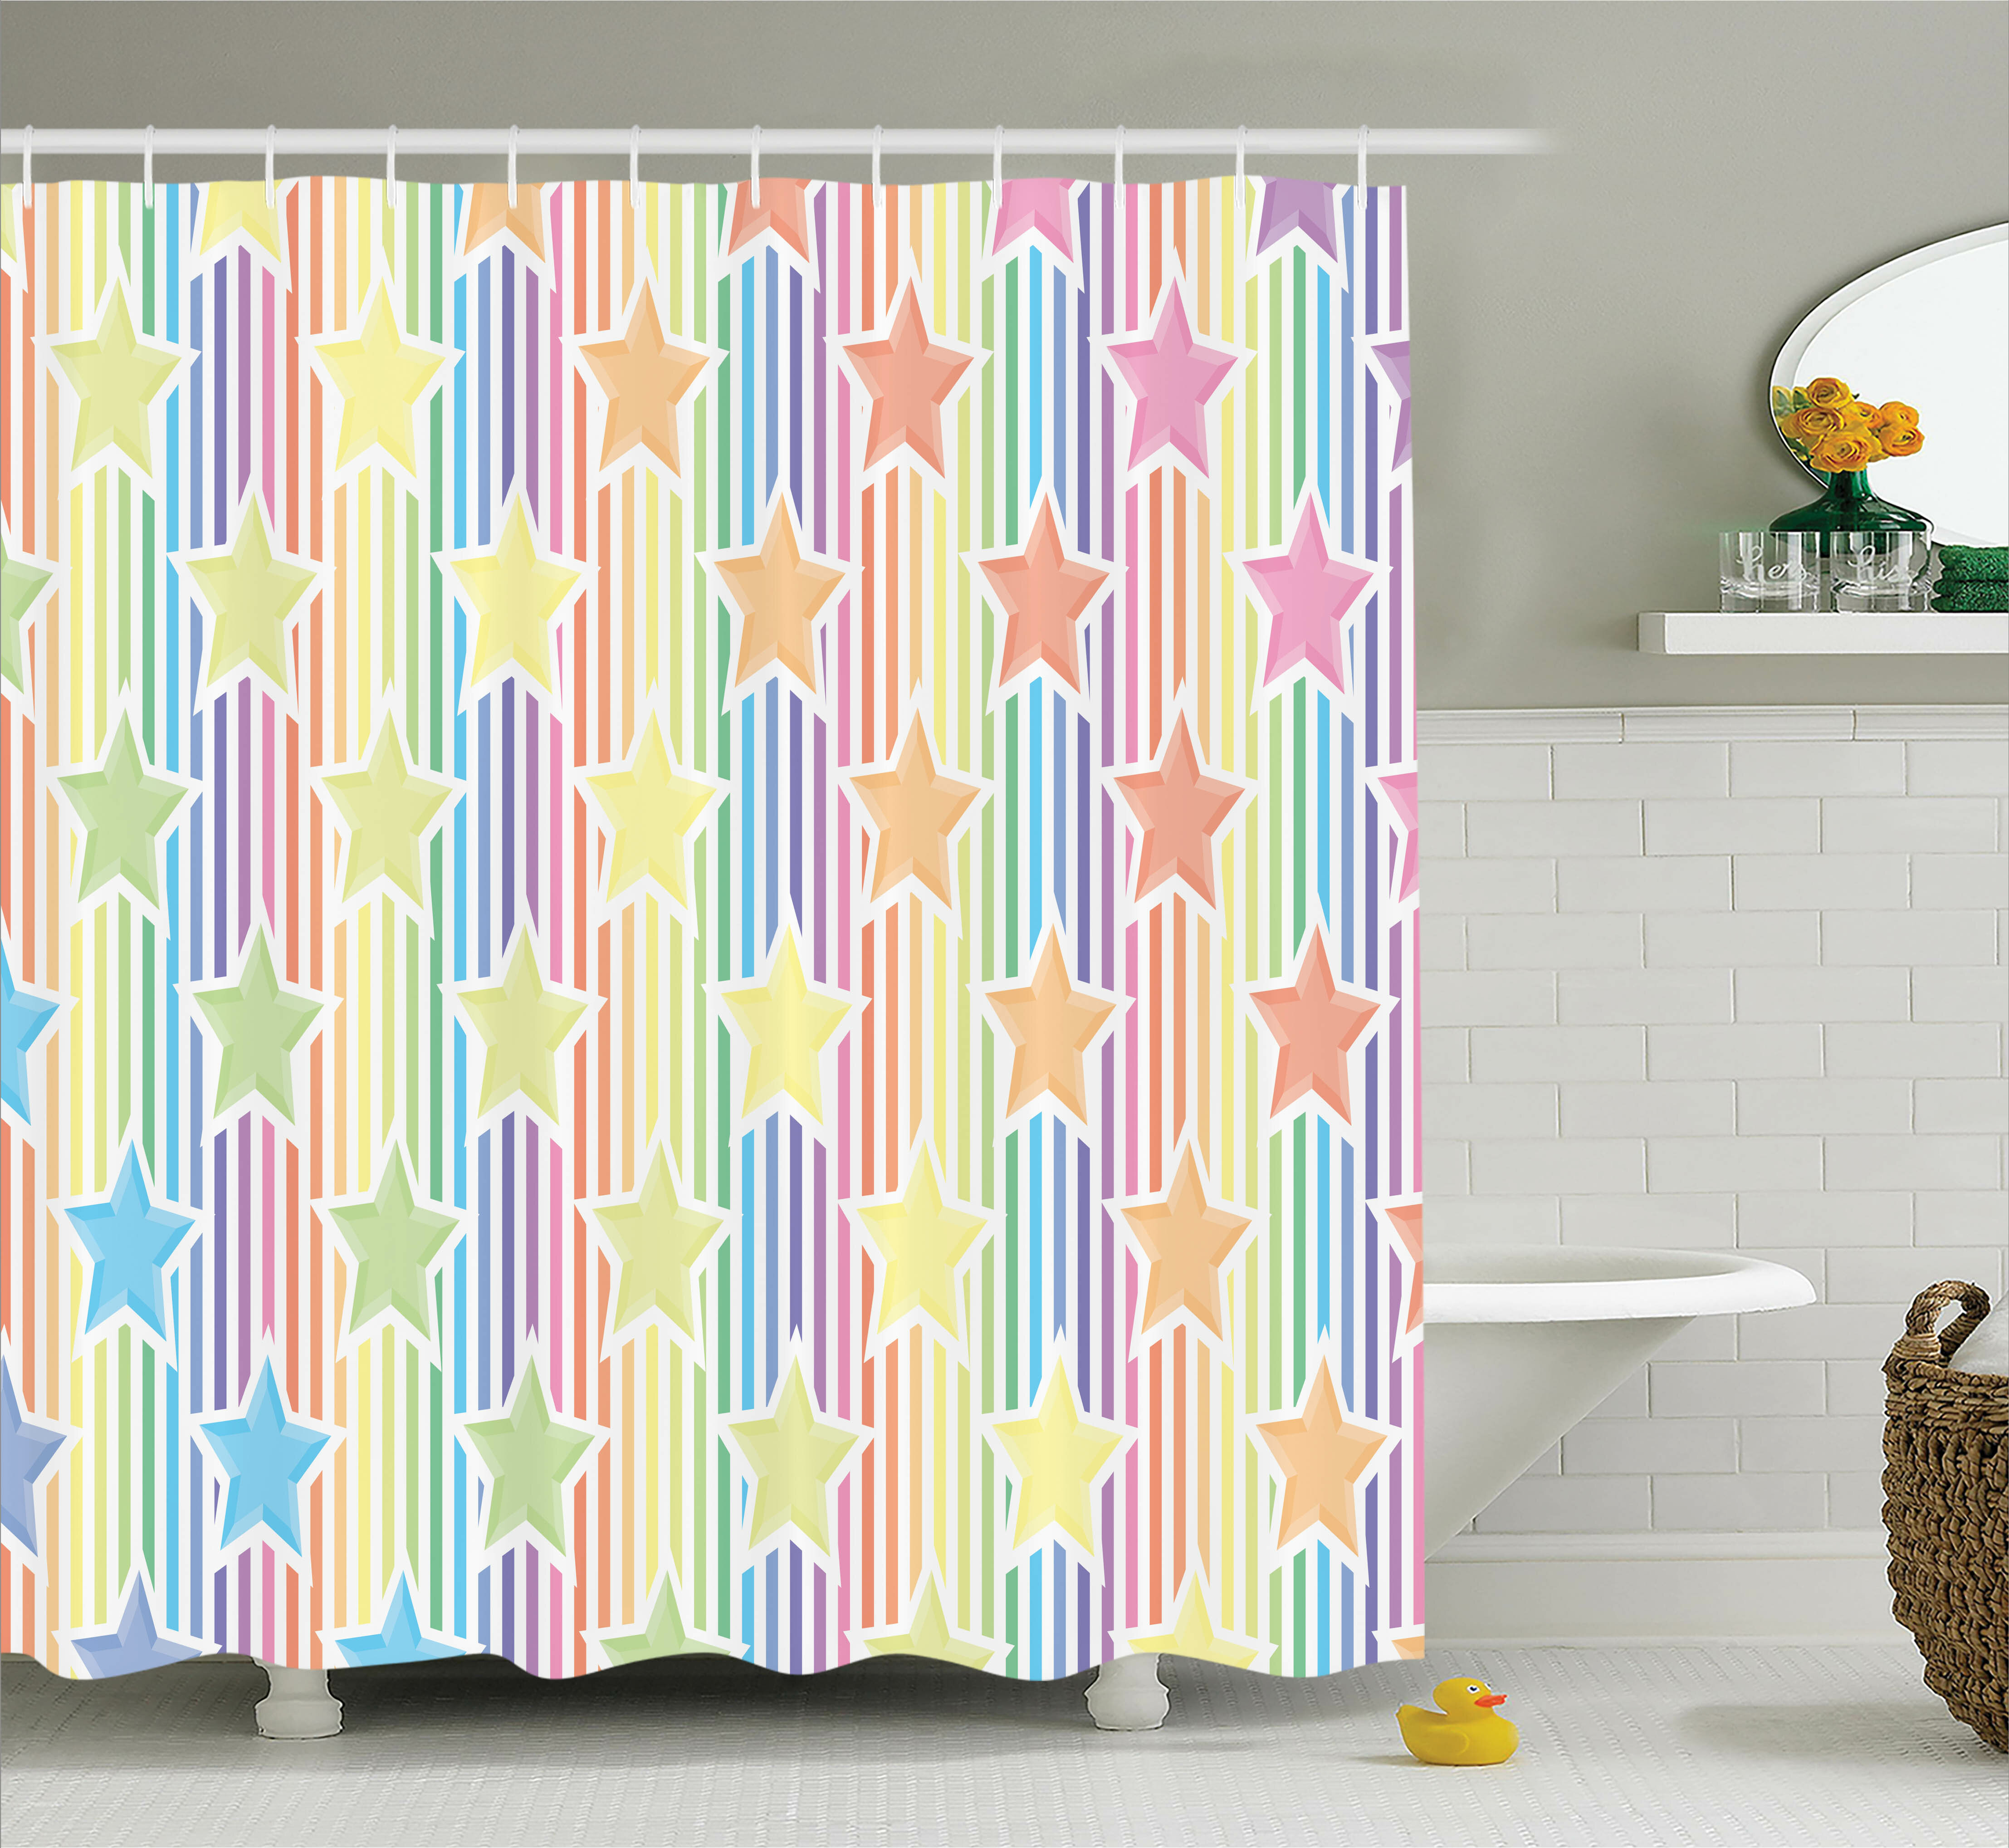 Ebern Designs Brenda Rainbow Stars On Colorful Striped Fun Art Abstract Teen Room Playroom Concept Shower Curtain